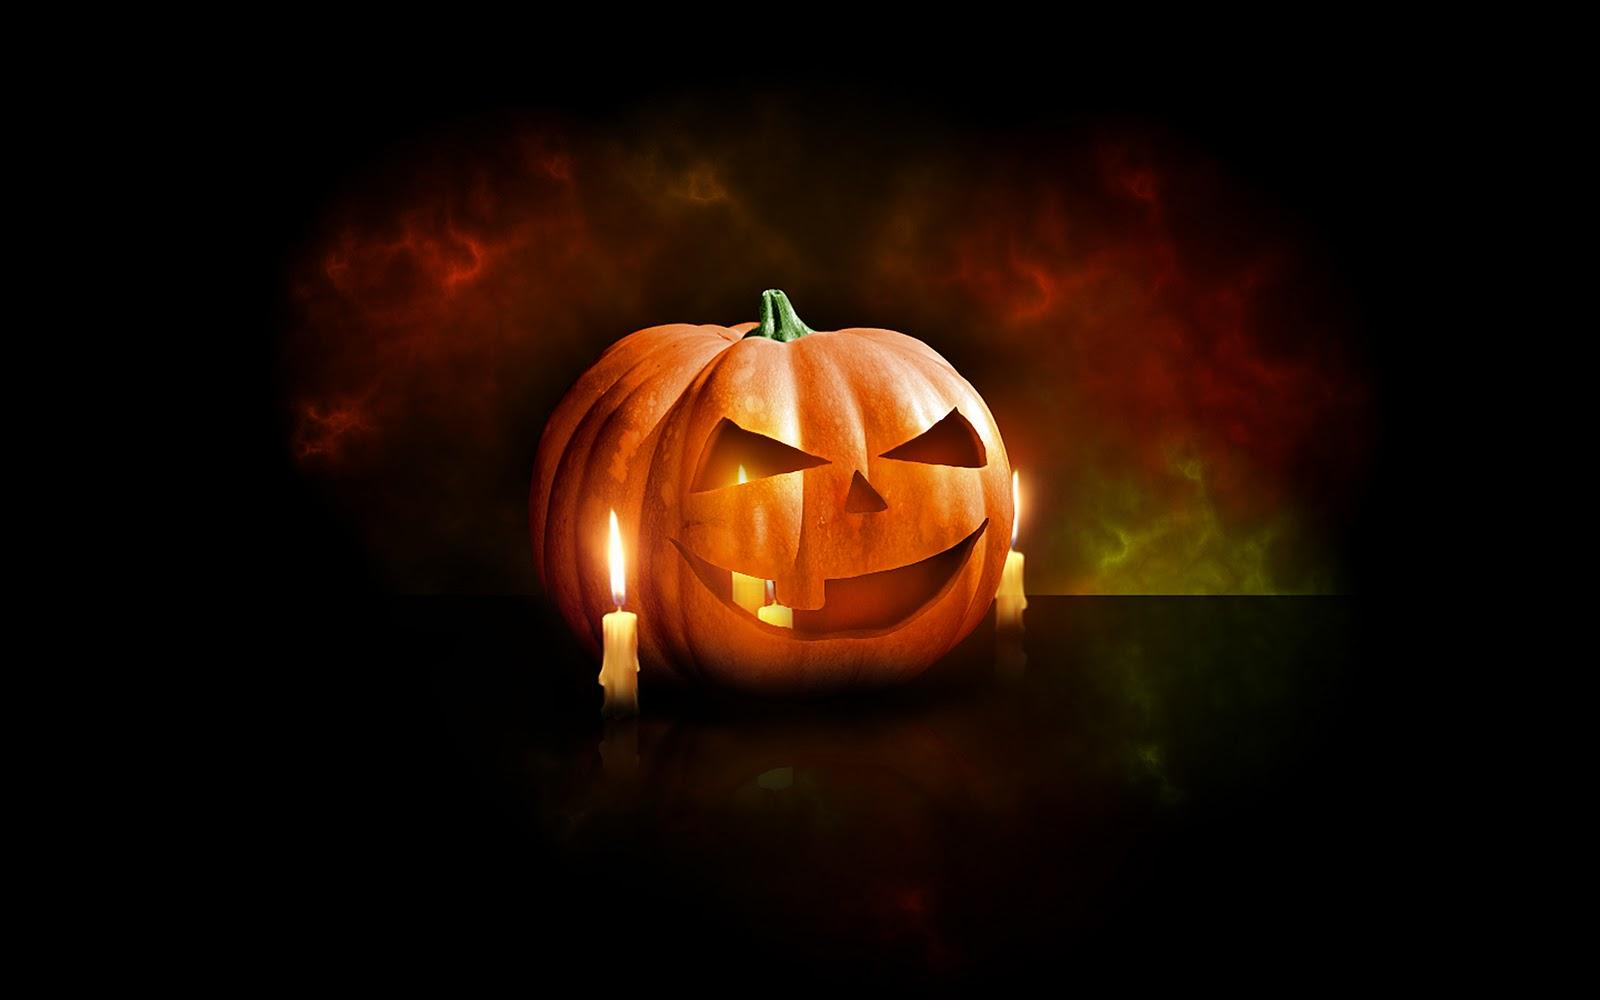 http://3.bp.blogspot.com/-Y6kU8prxGsU/Tr-YuaGpPLI/AAAAAAAAAI0/2A3M_LFhzLc/s1600/Halloween+Computer+Wallpaper.jpg